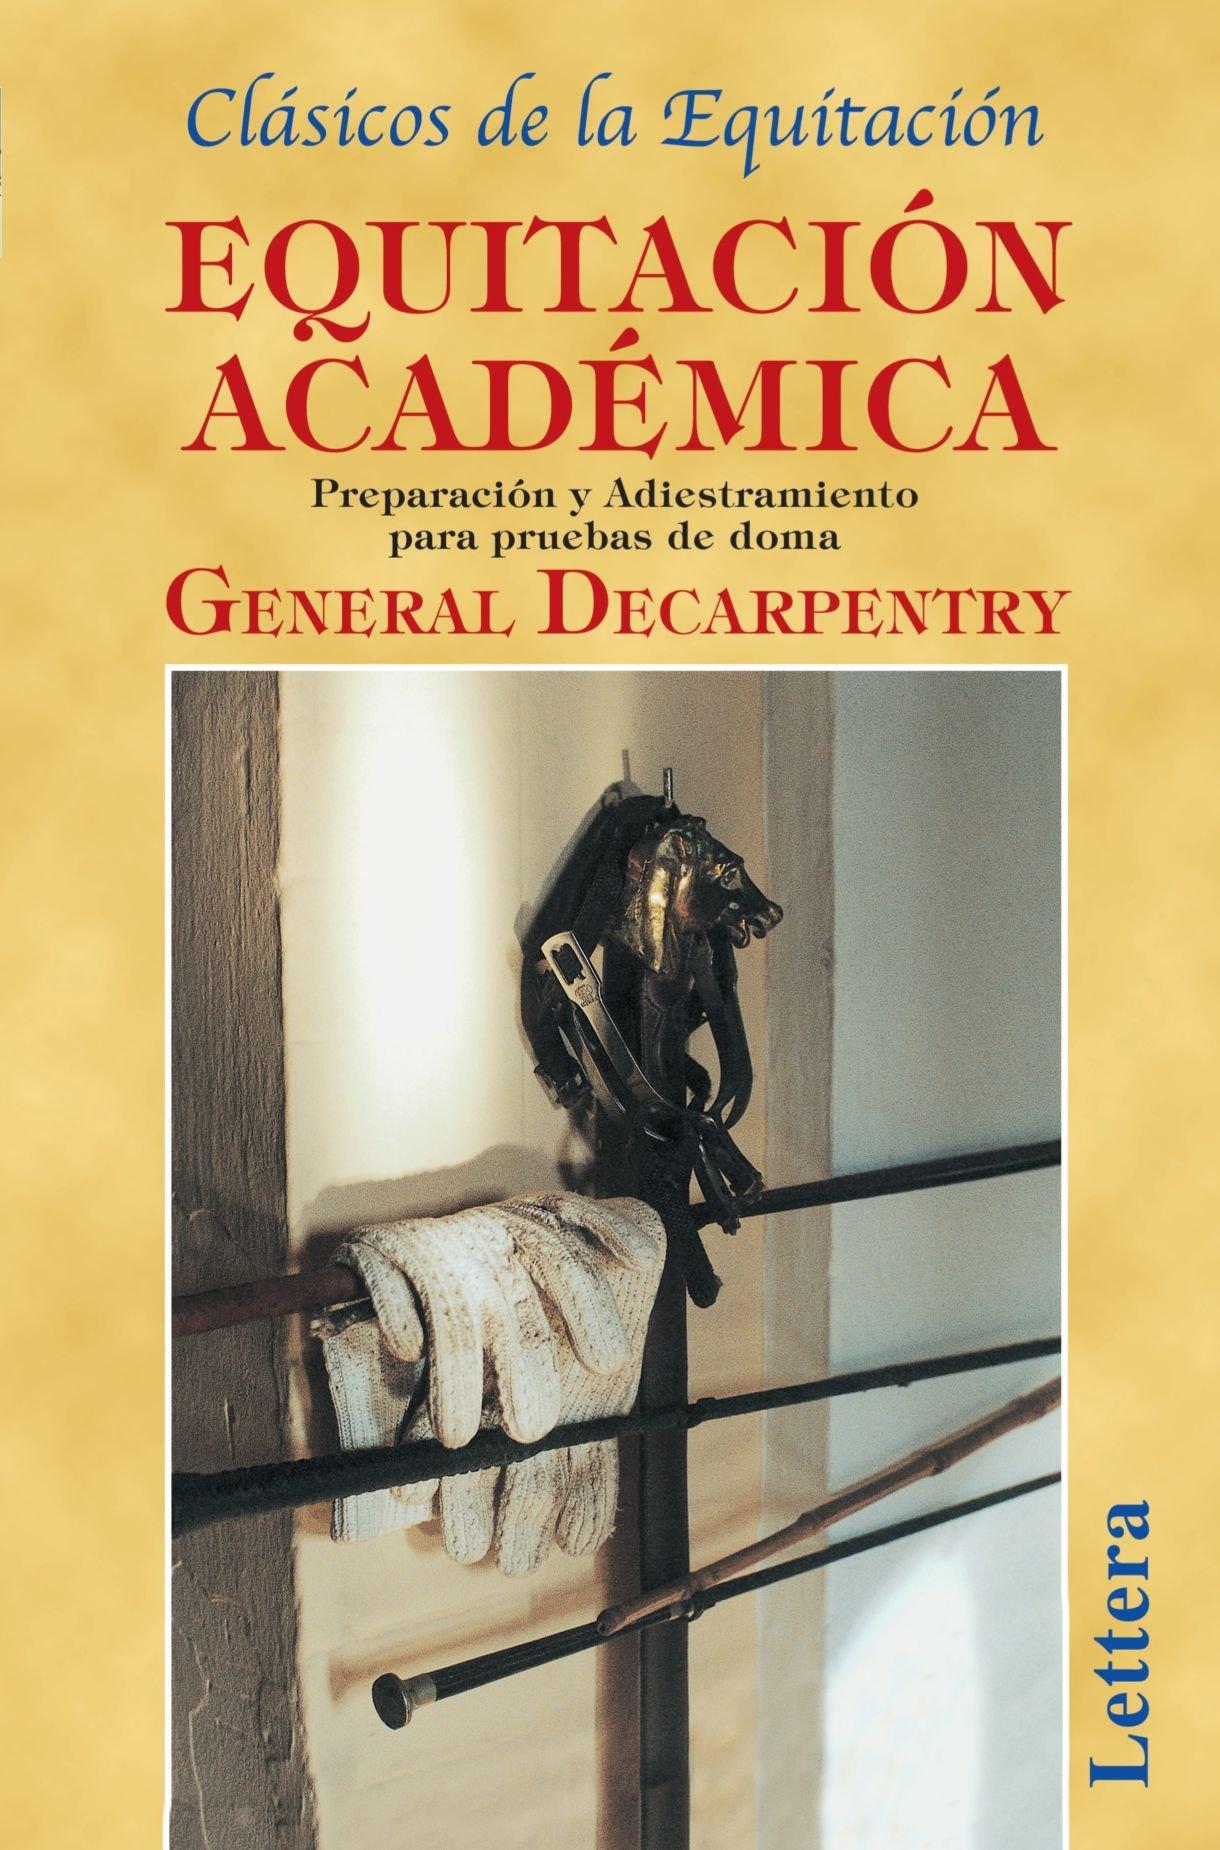 Equitación Académica Tapa blanda – 30 mar 2010 General Decarpentry Grupo Lettera S.L. 8493189642